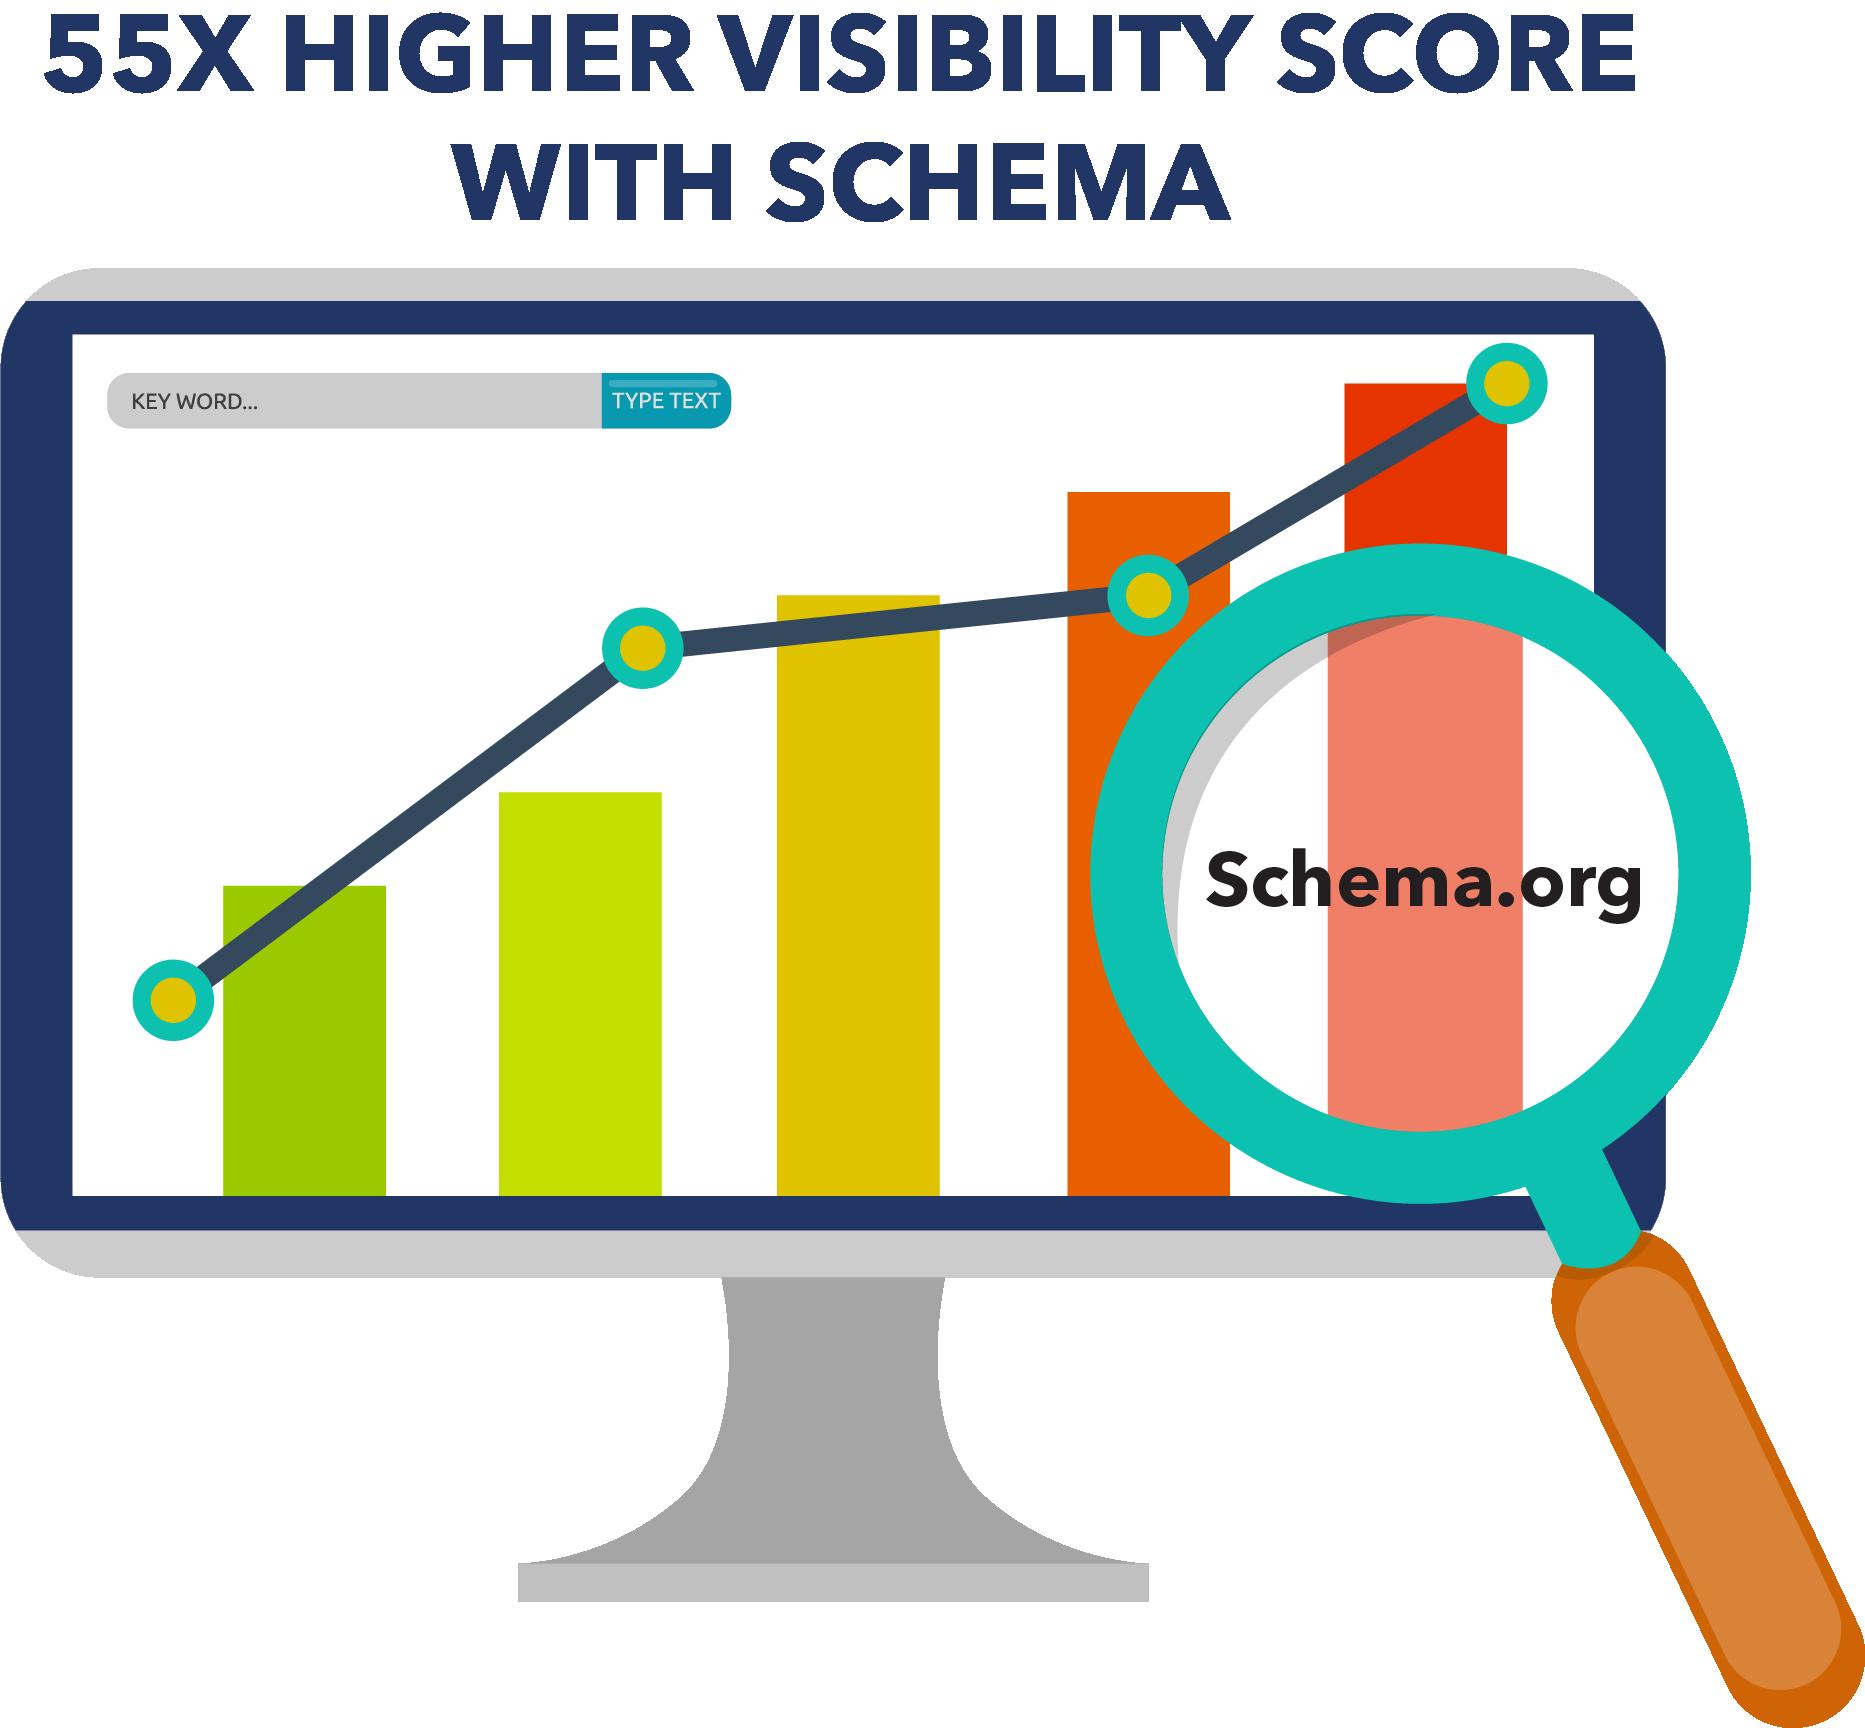 Knowledge clipart schema. Search engine optimisation seo